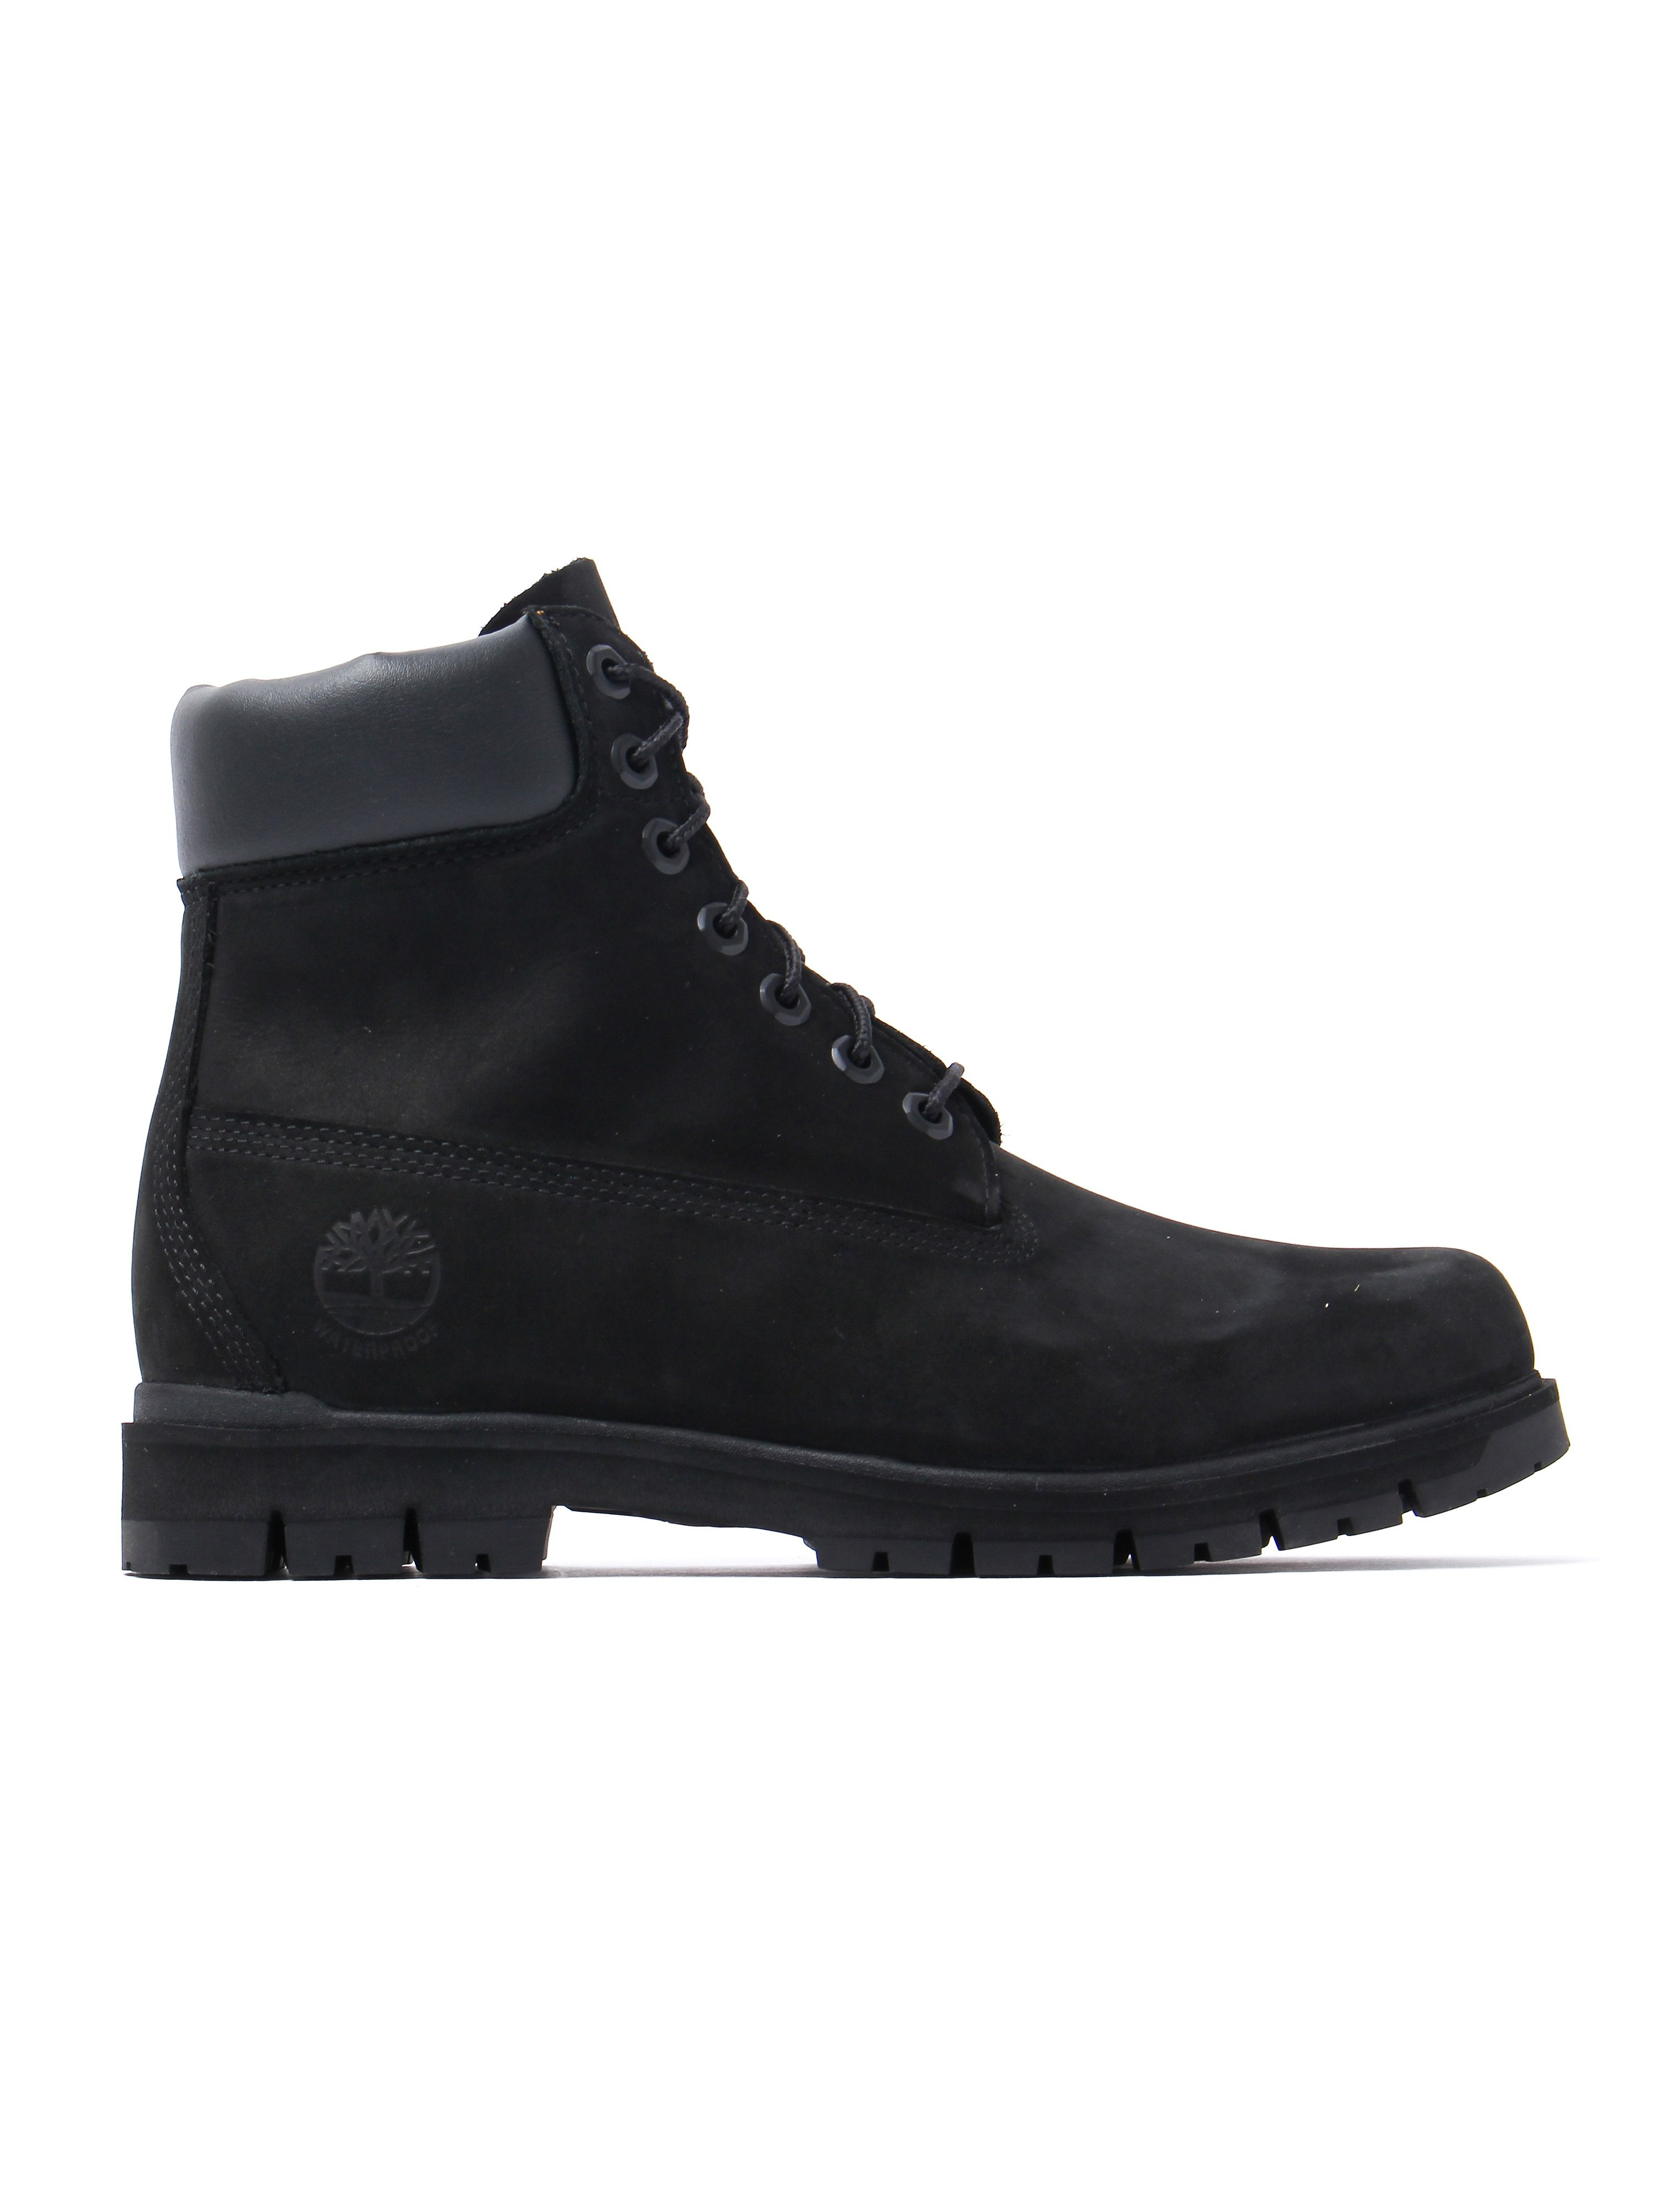 Timberland Men's Radford 6 Inch Boots - Black Nubuck